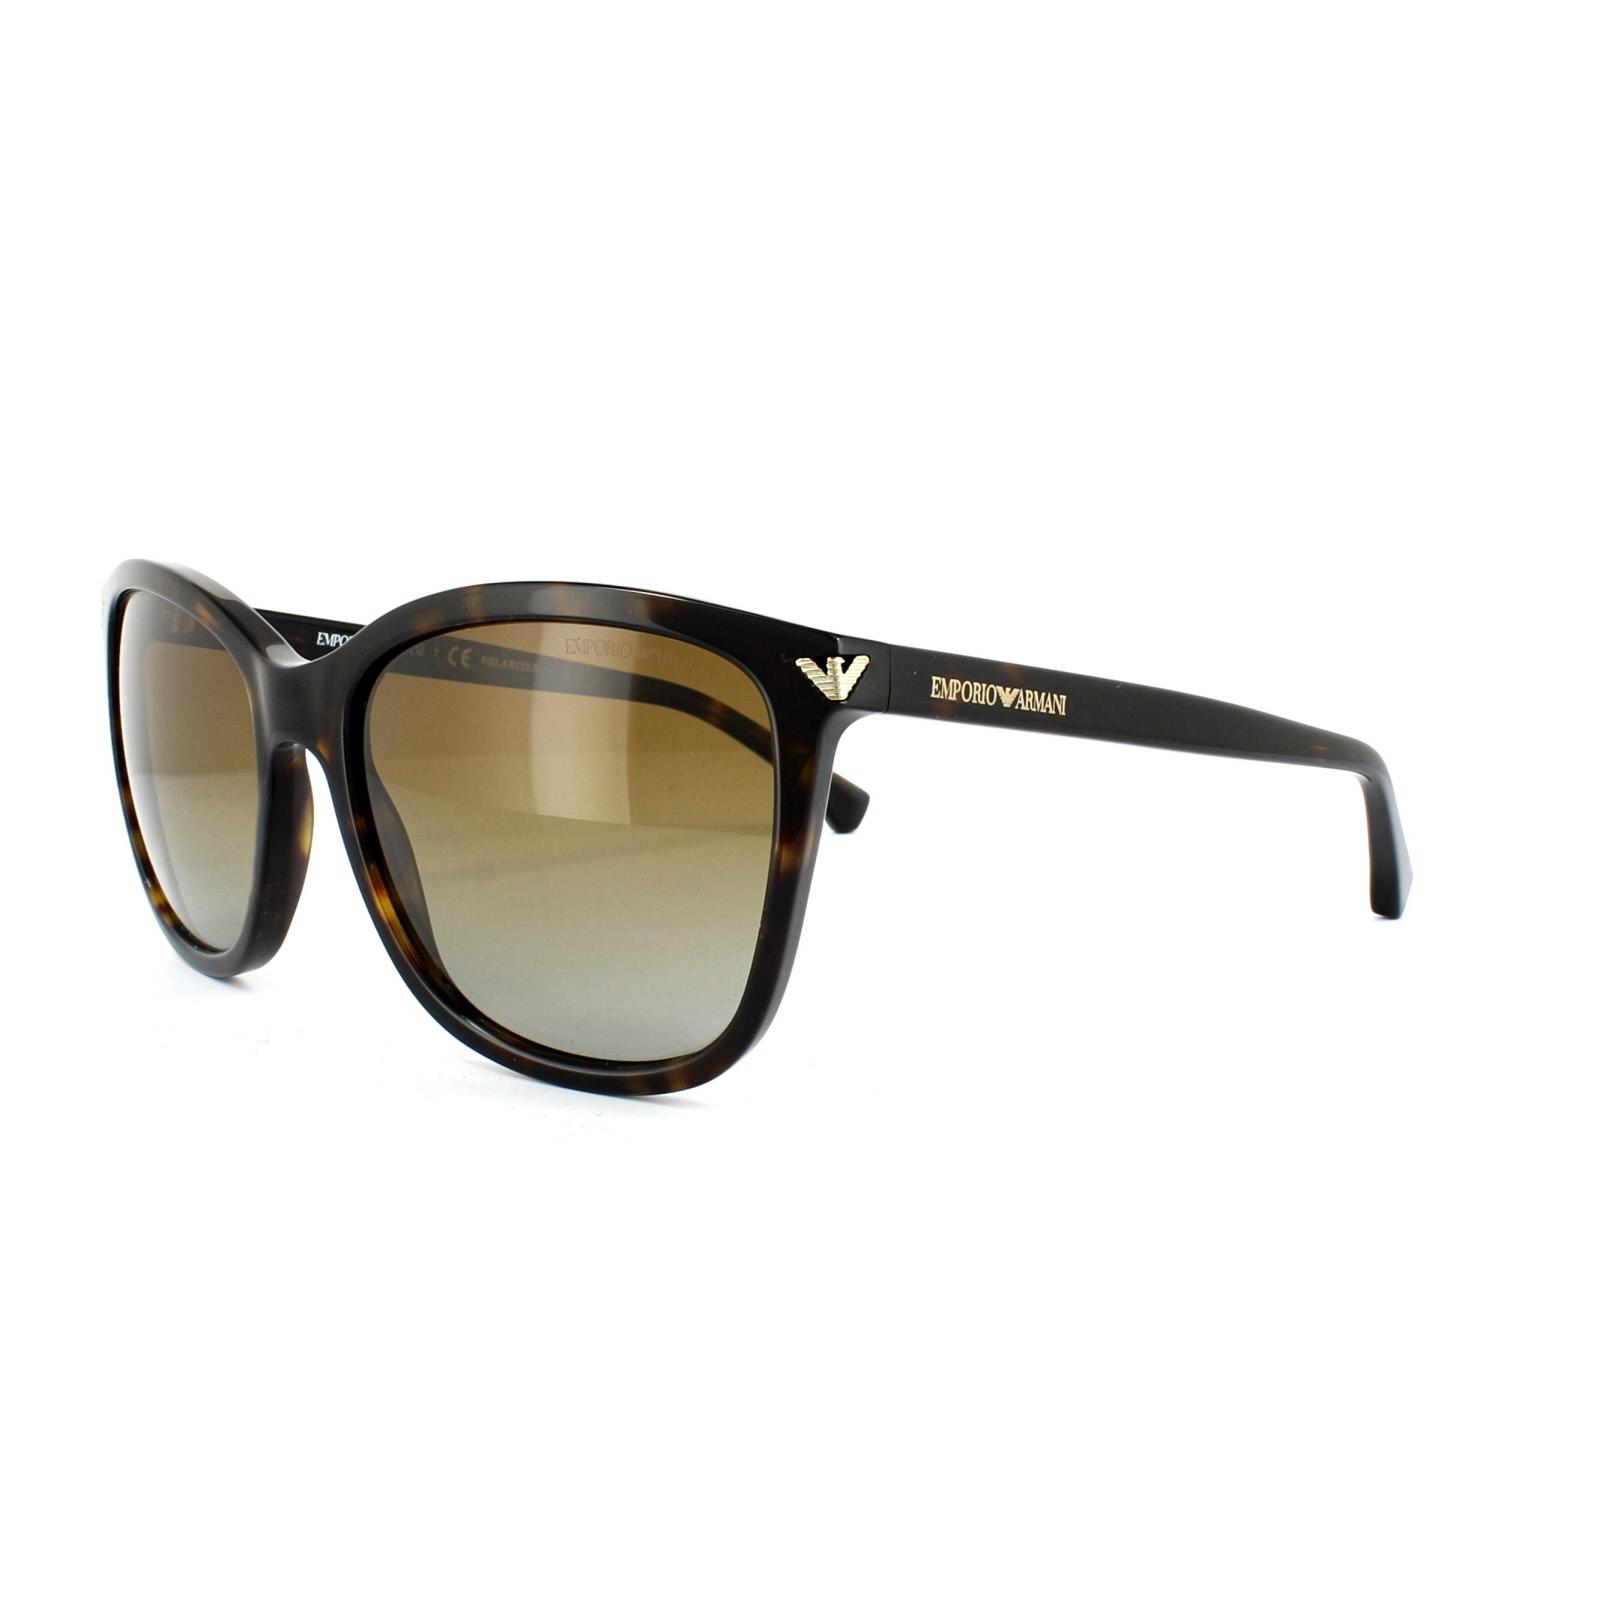 Emporio Armani EA4060 5026/T5 Sonnenbrille polarized tDbKx